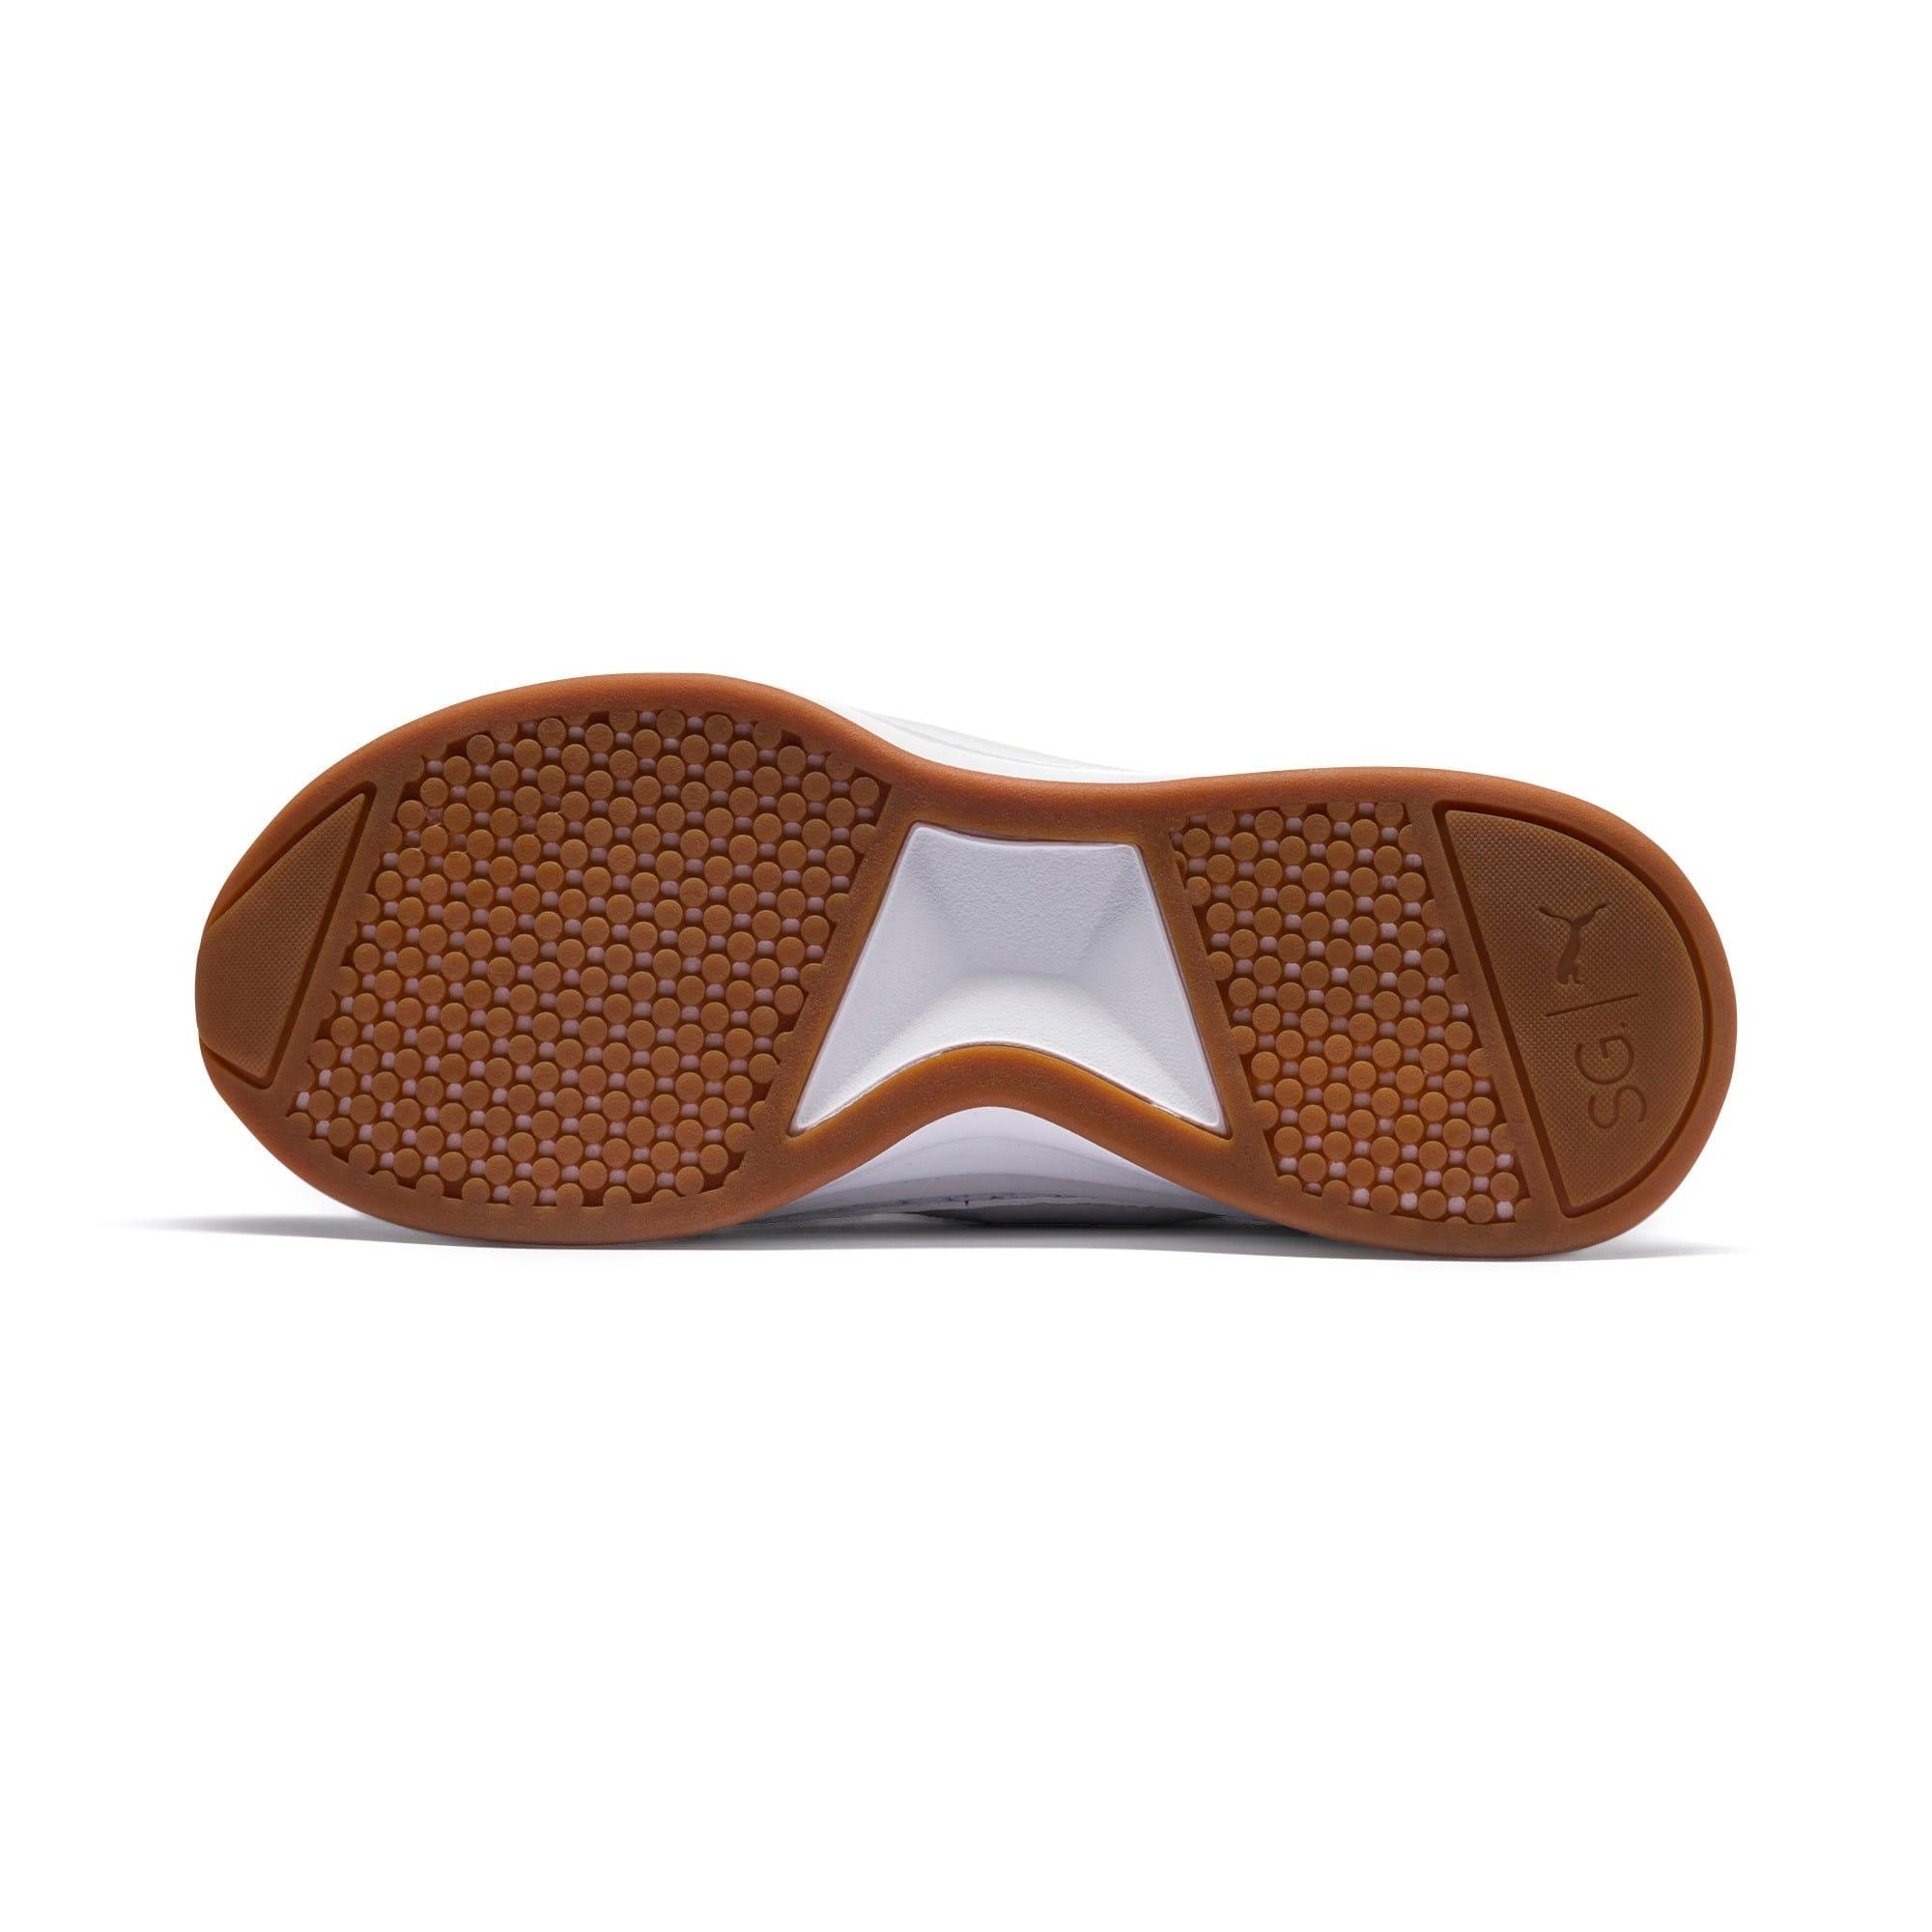 Thumbnail 4 of PUMA x SELENA GOMEZ Runner Women's Training Shoes, Puma White, medium-IND